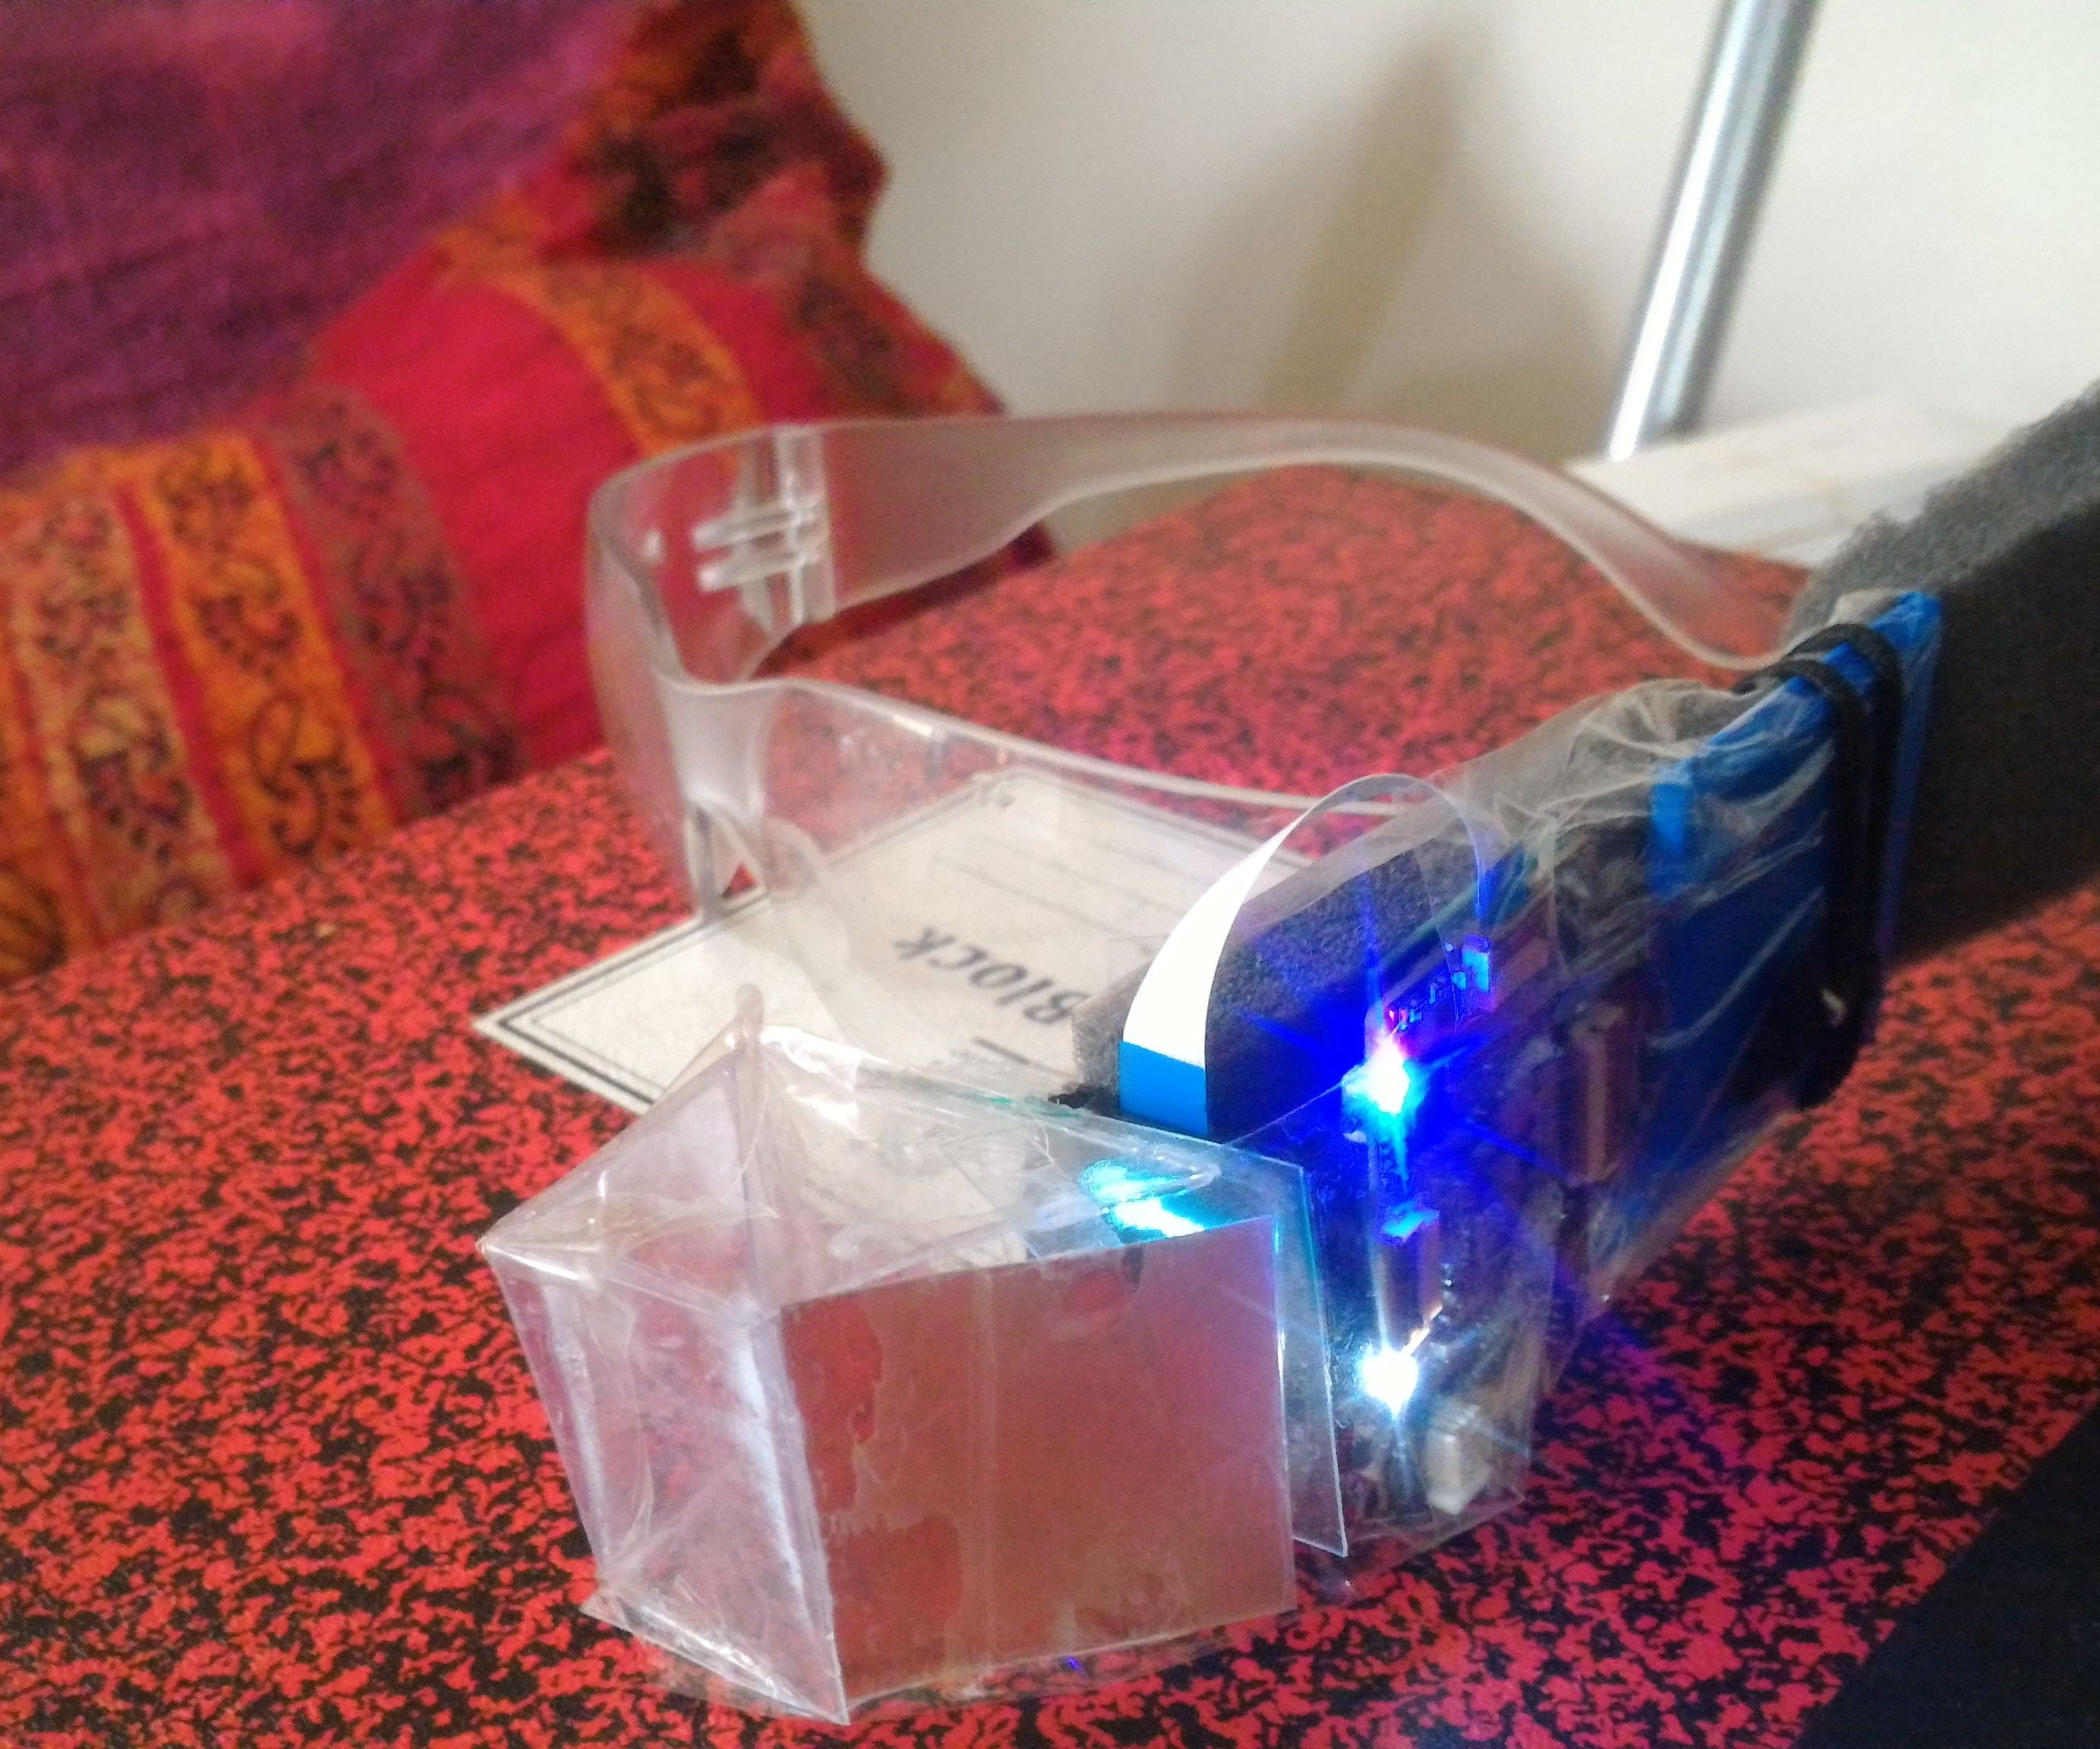 Intel Glass_Augmented reality headset